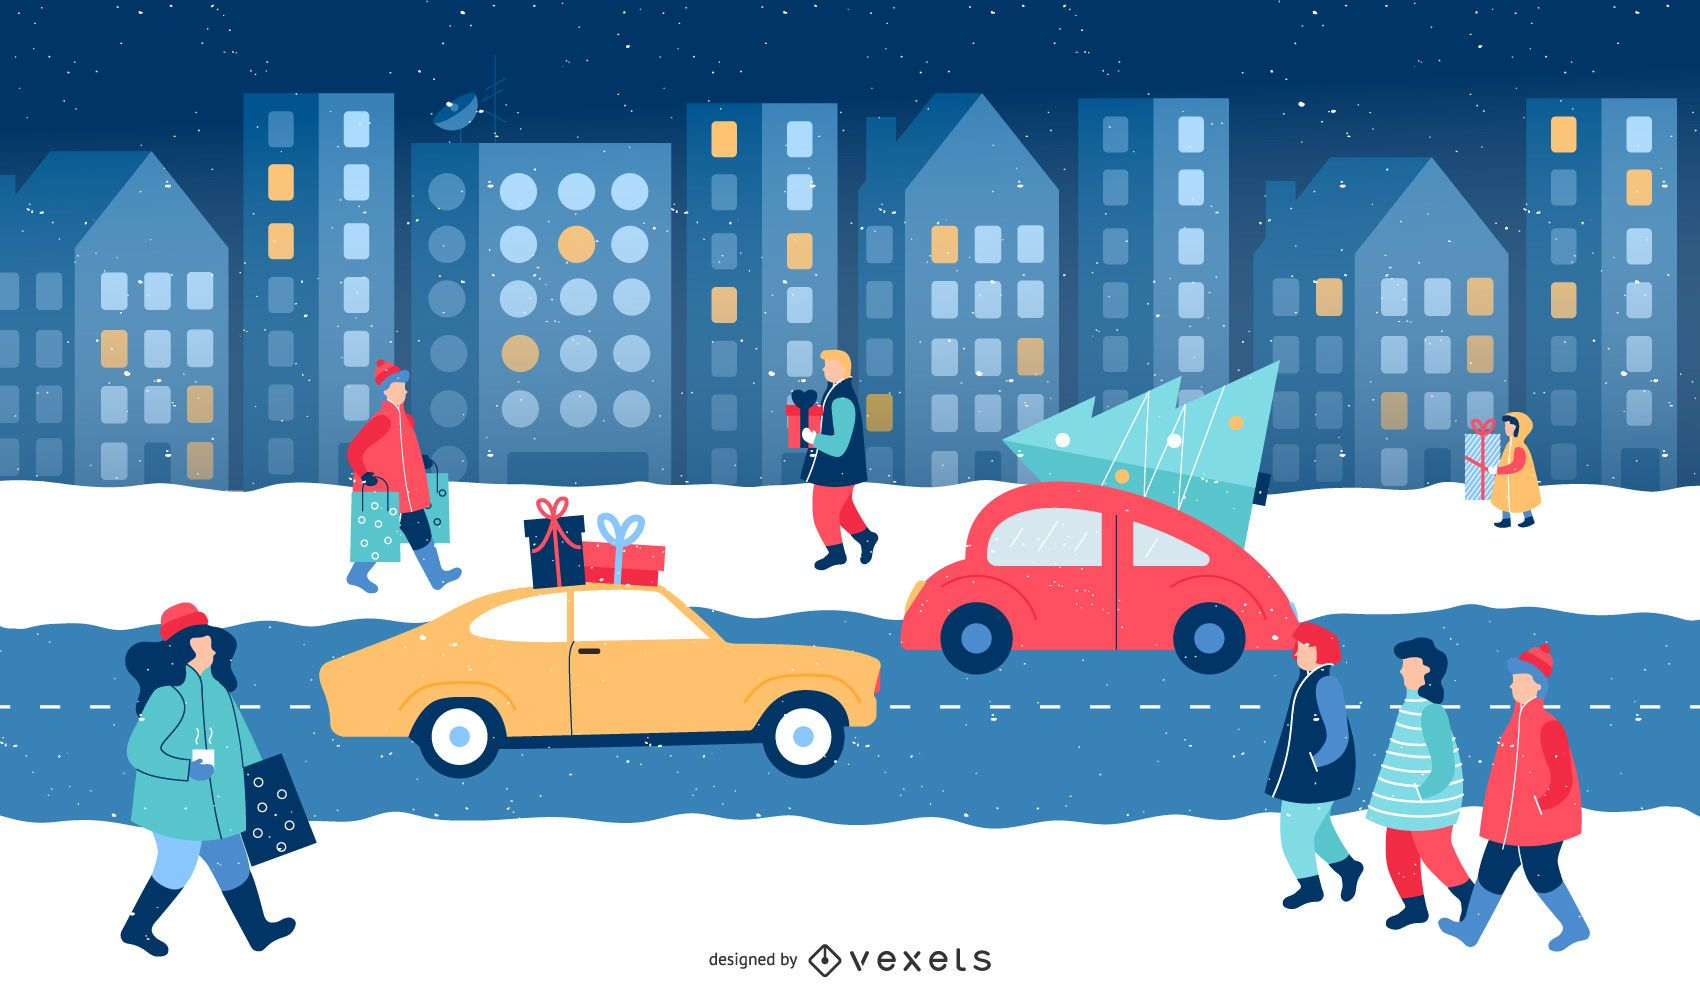 City Christmas Winter Illustration Scene